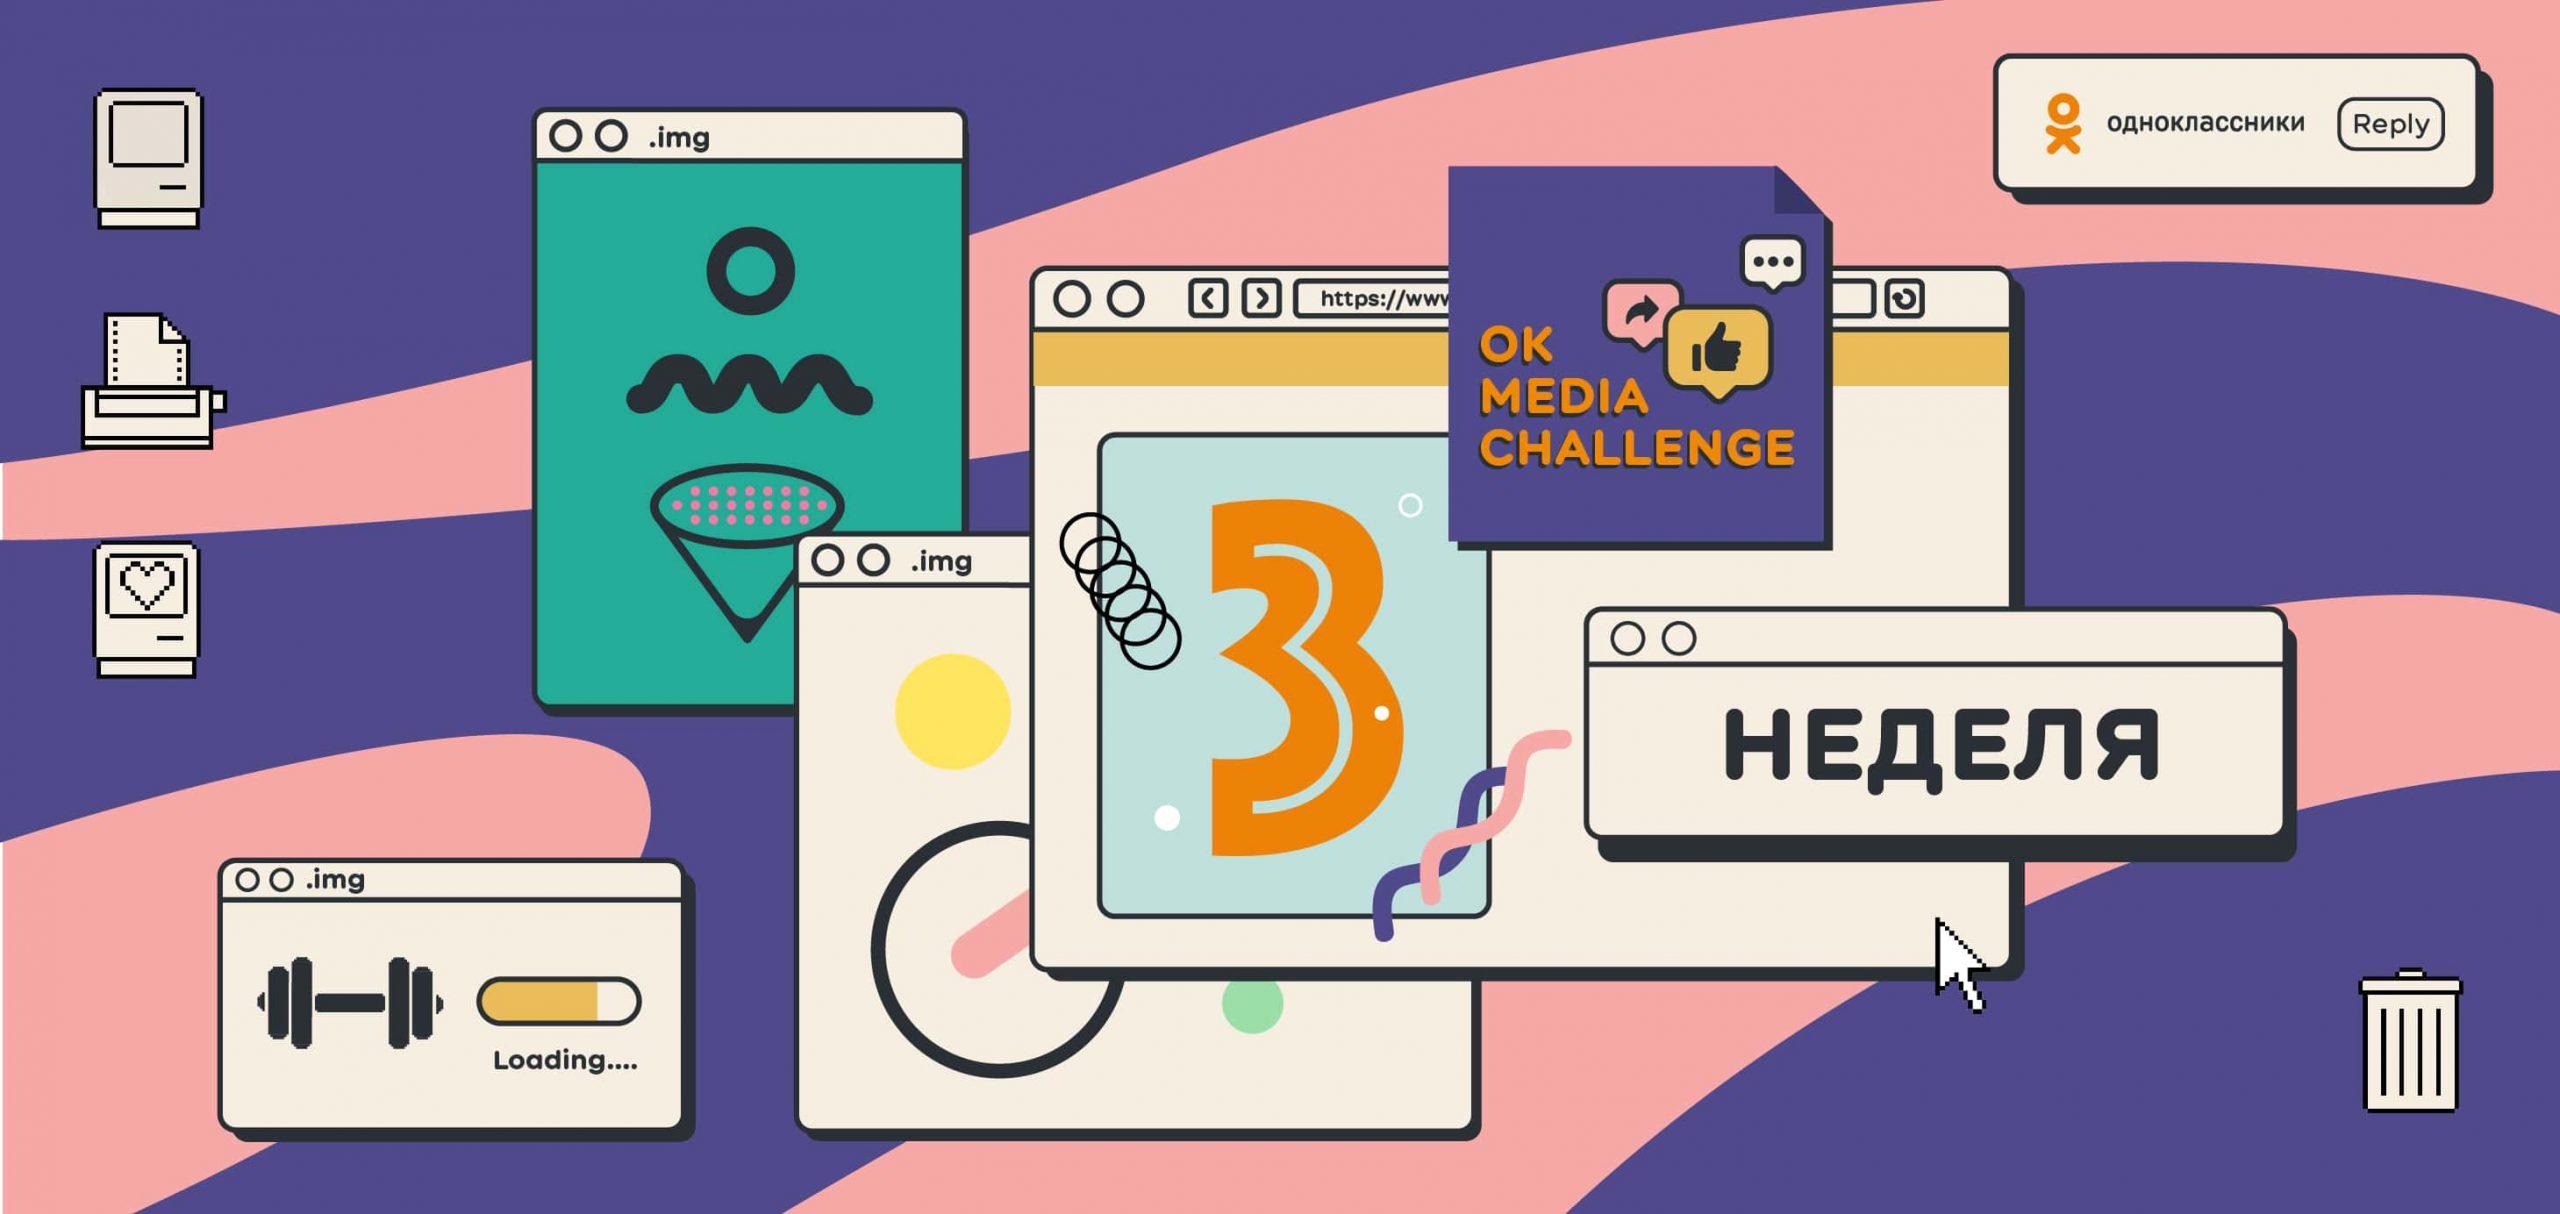 OK Media Challenge 2021: Итоги третьей недели